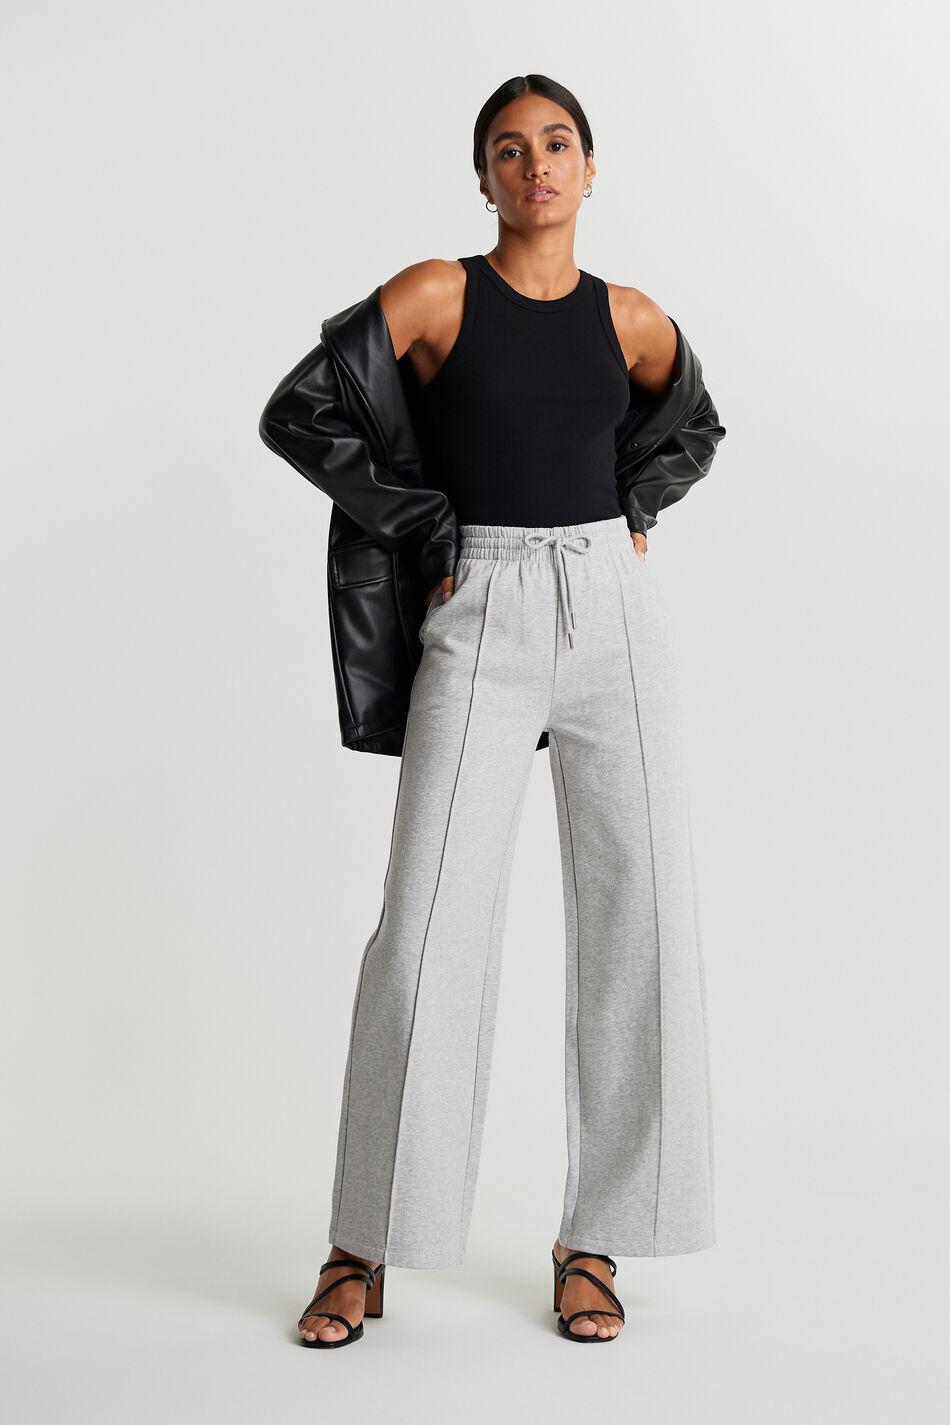 Gina Tricot Bonnie sweatpants L Female Grey melange (8181)